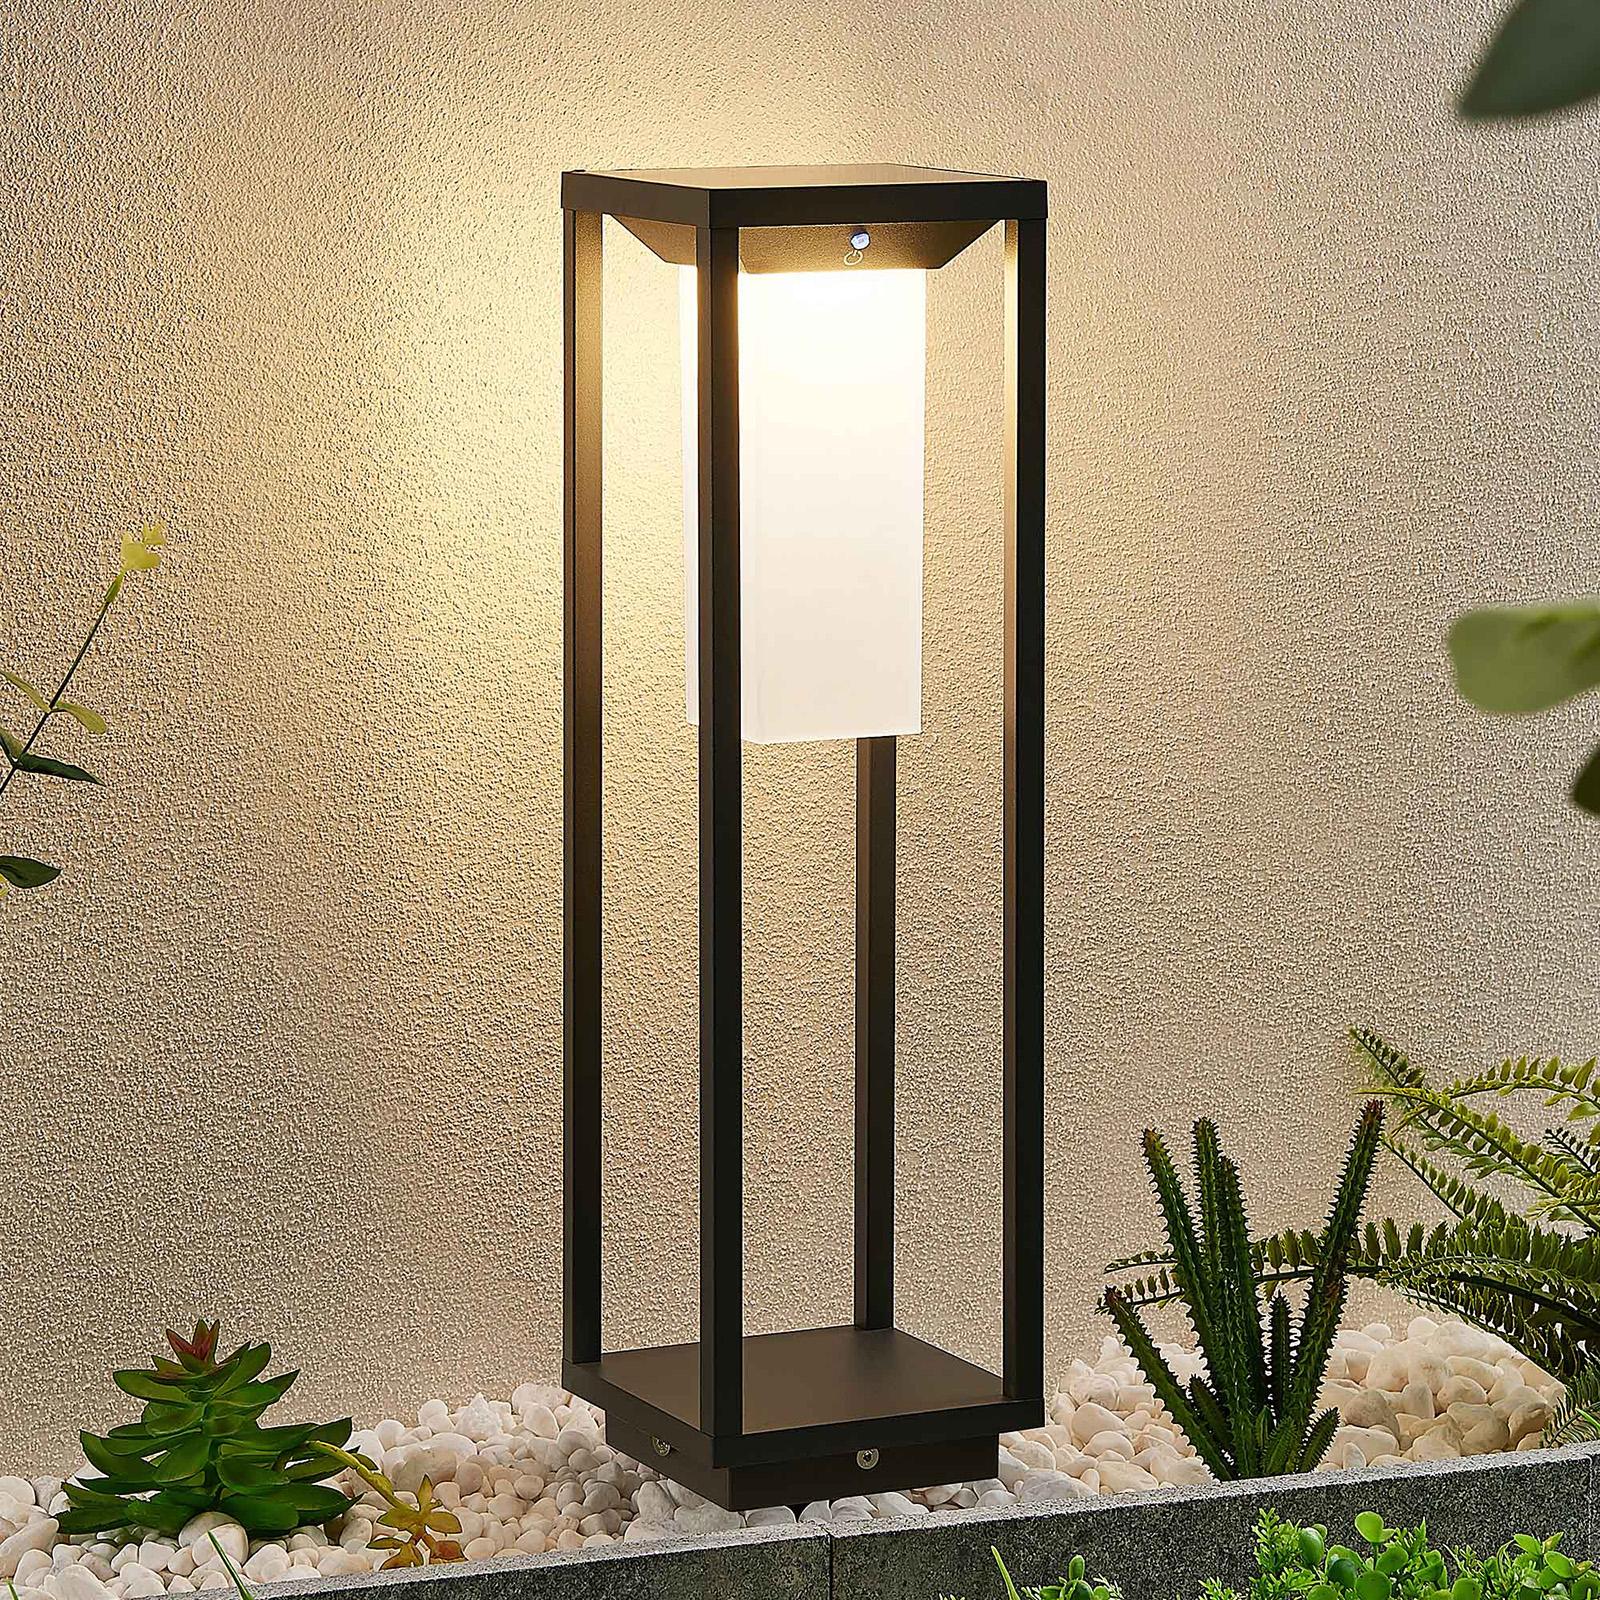 Lucande Eliel solarna lampa cokołowa LED, 50 cm